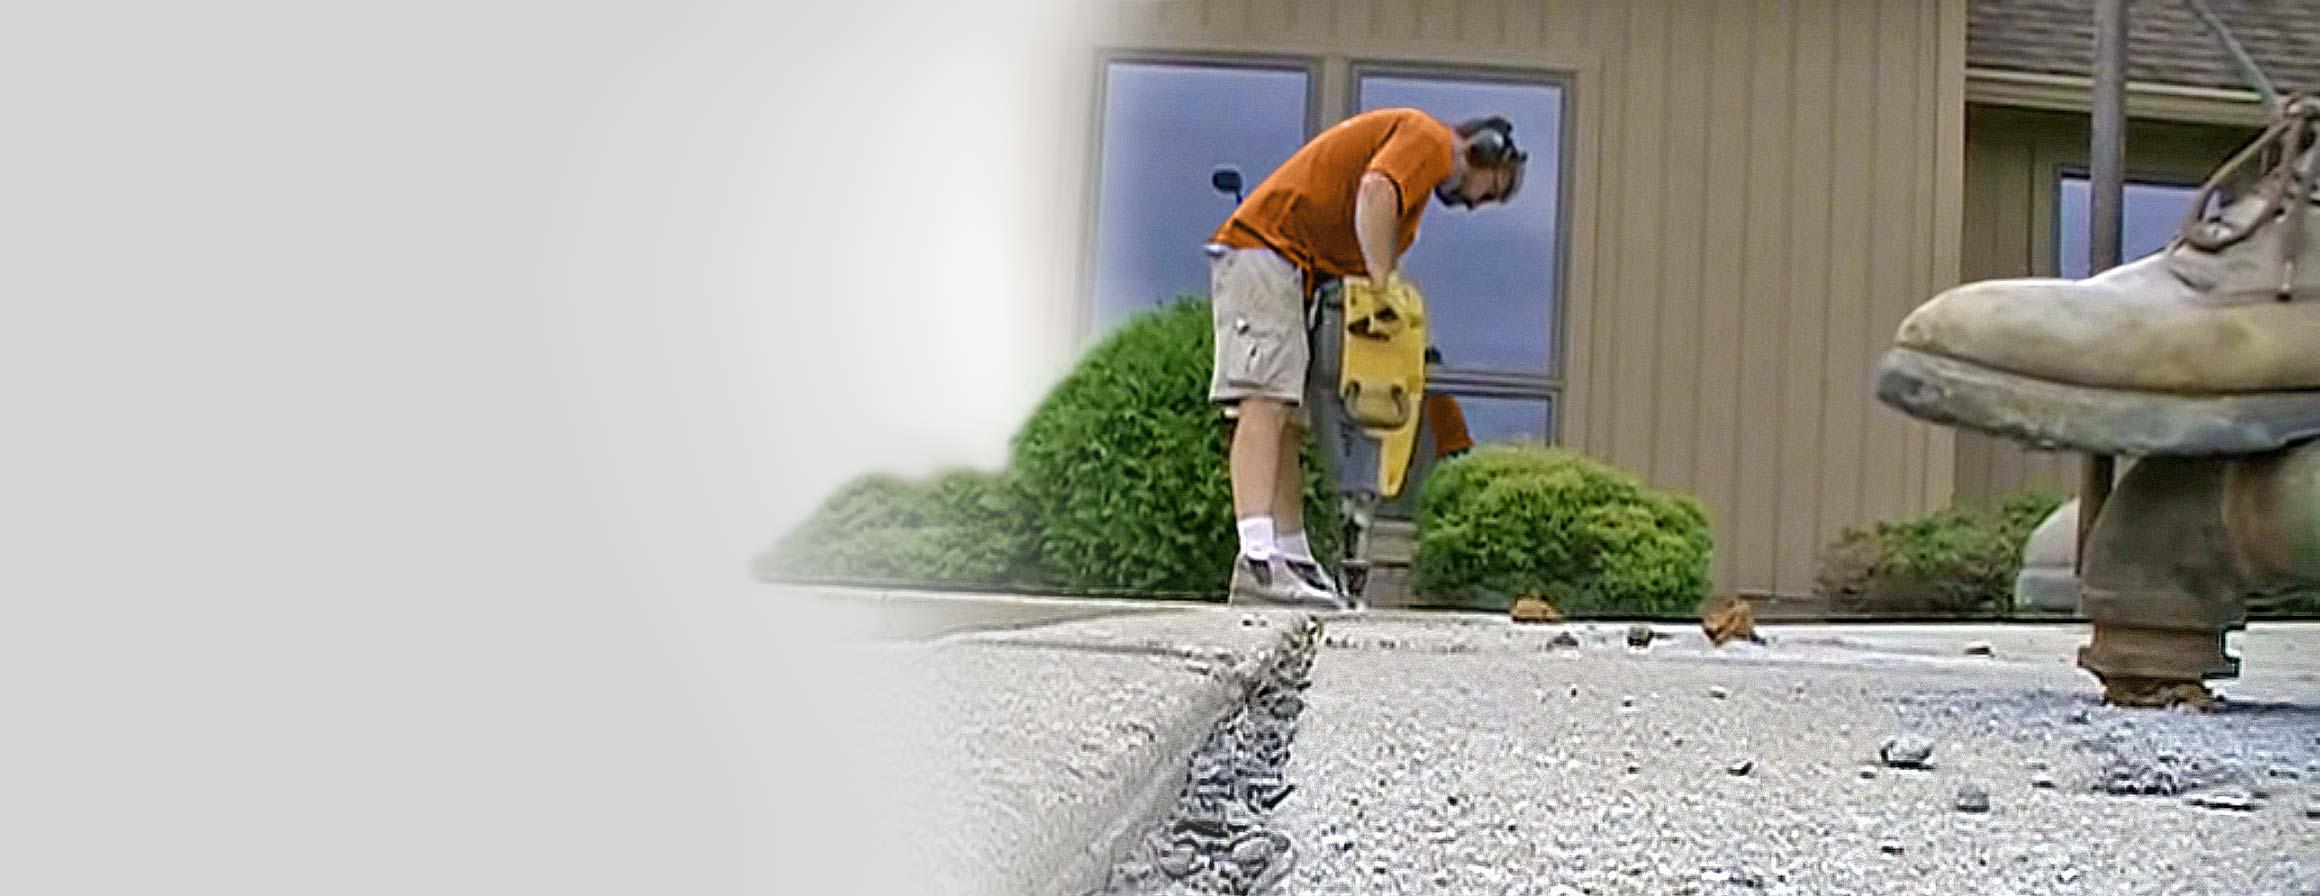 Mudjacking concrete to level trip hazards